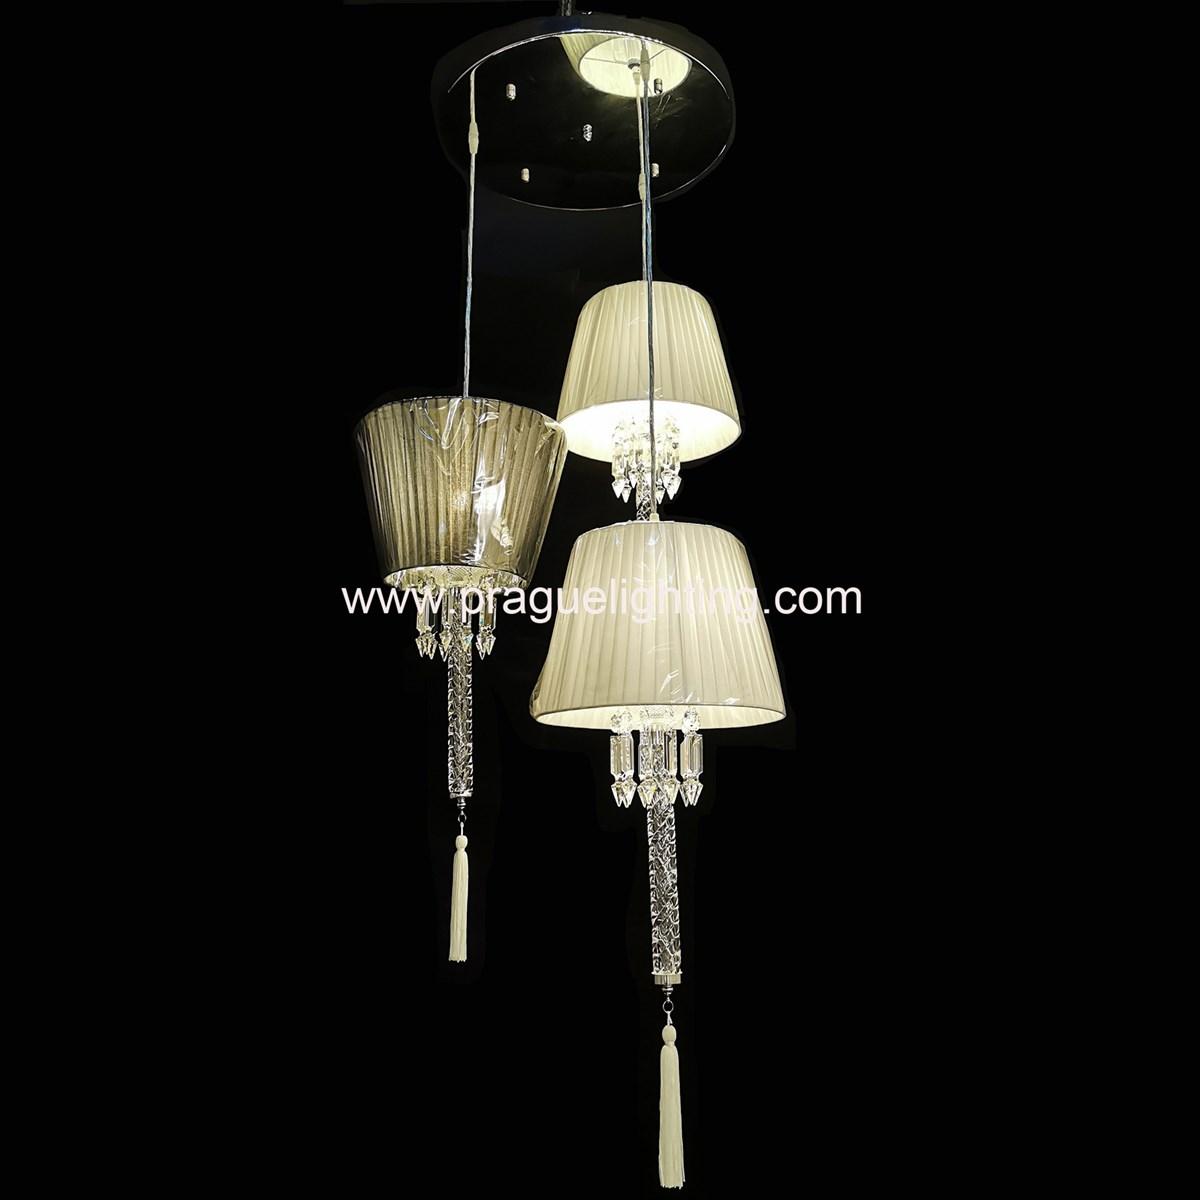 3 light pendant lamp baccarat replica